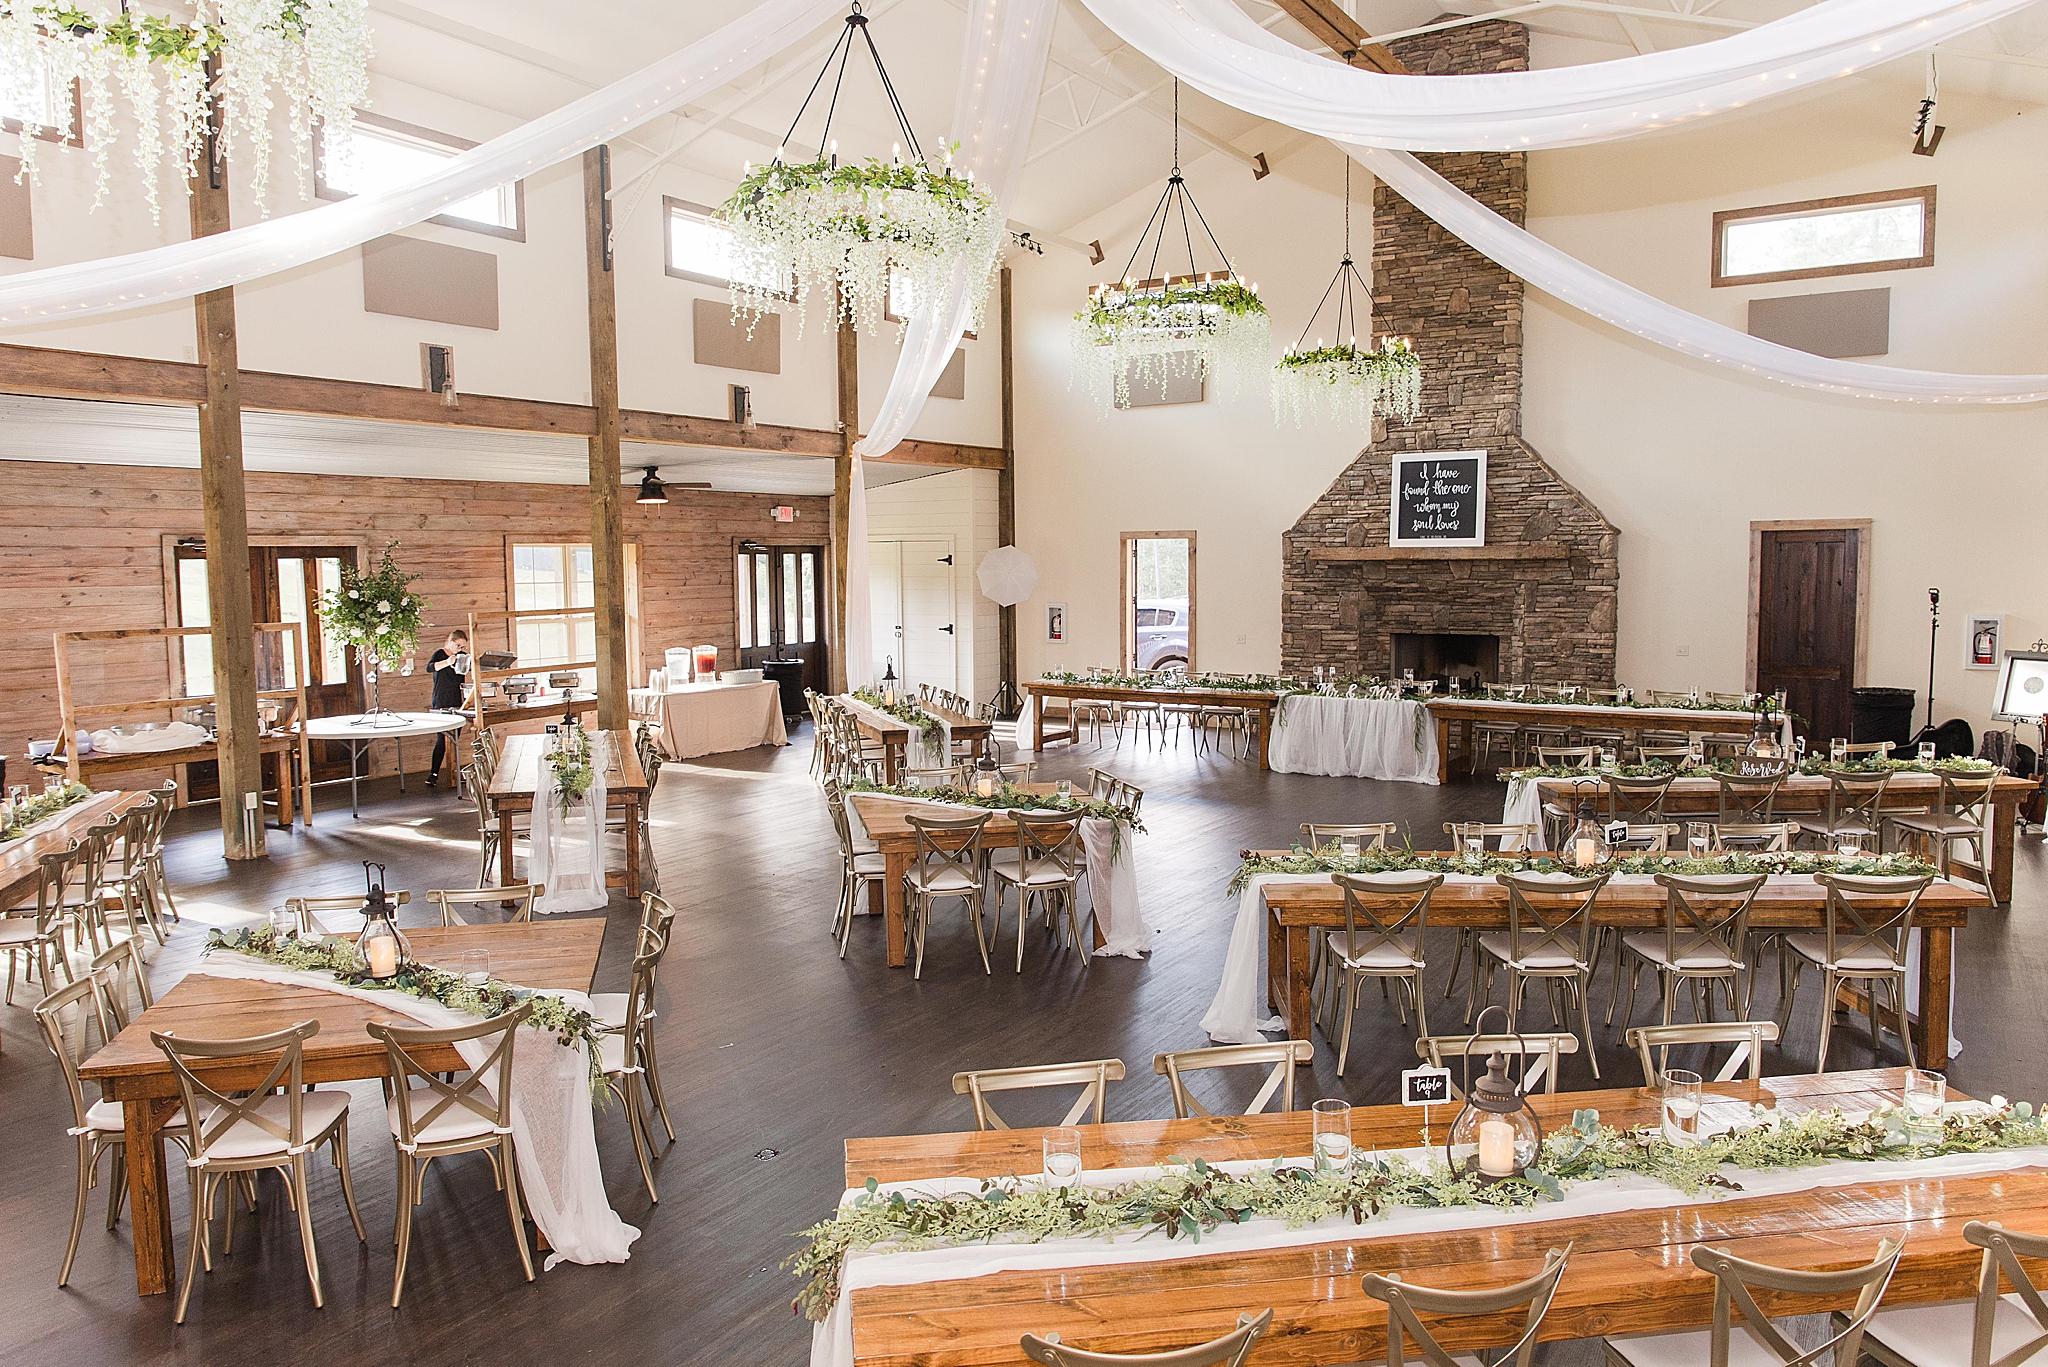 romantic rustic Izenstone wedding reception